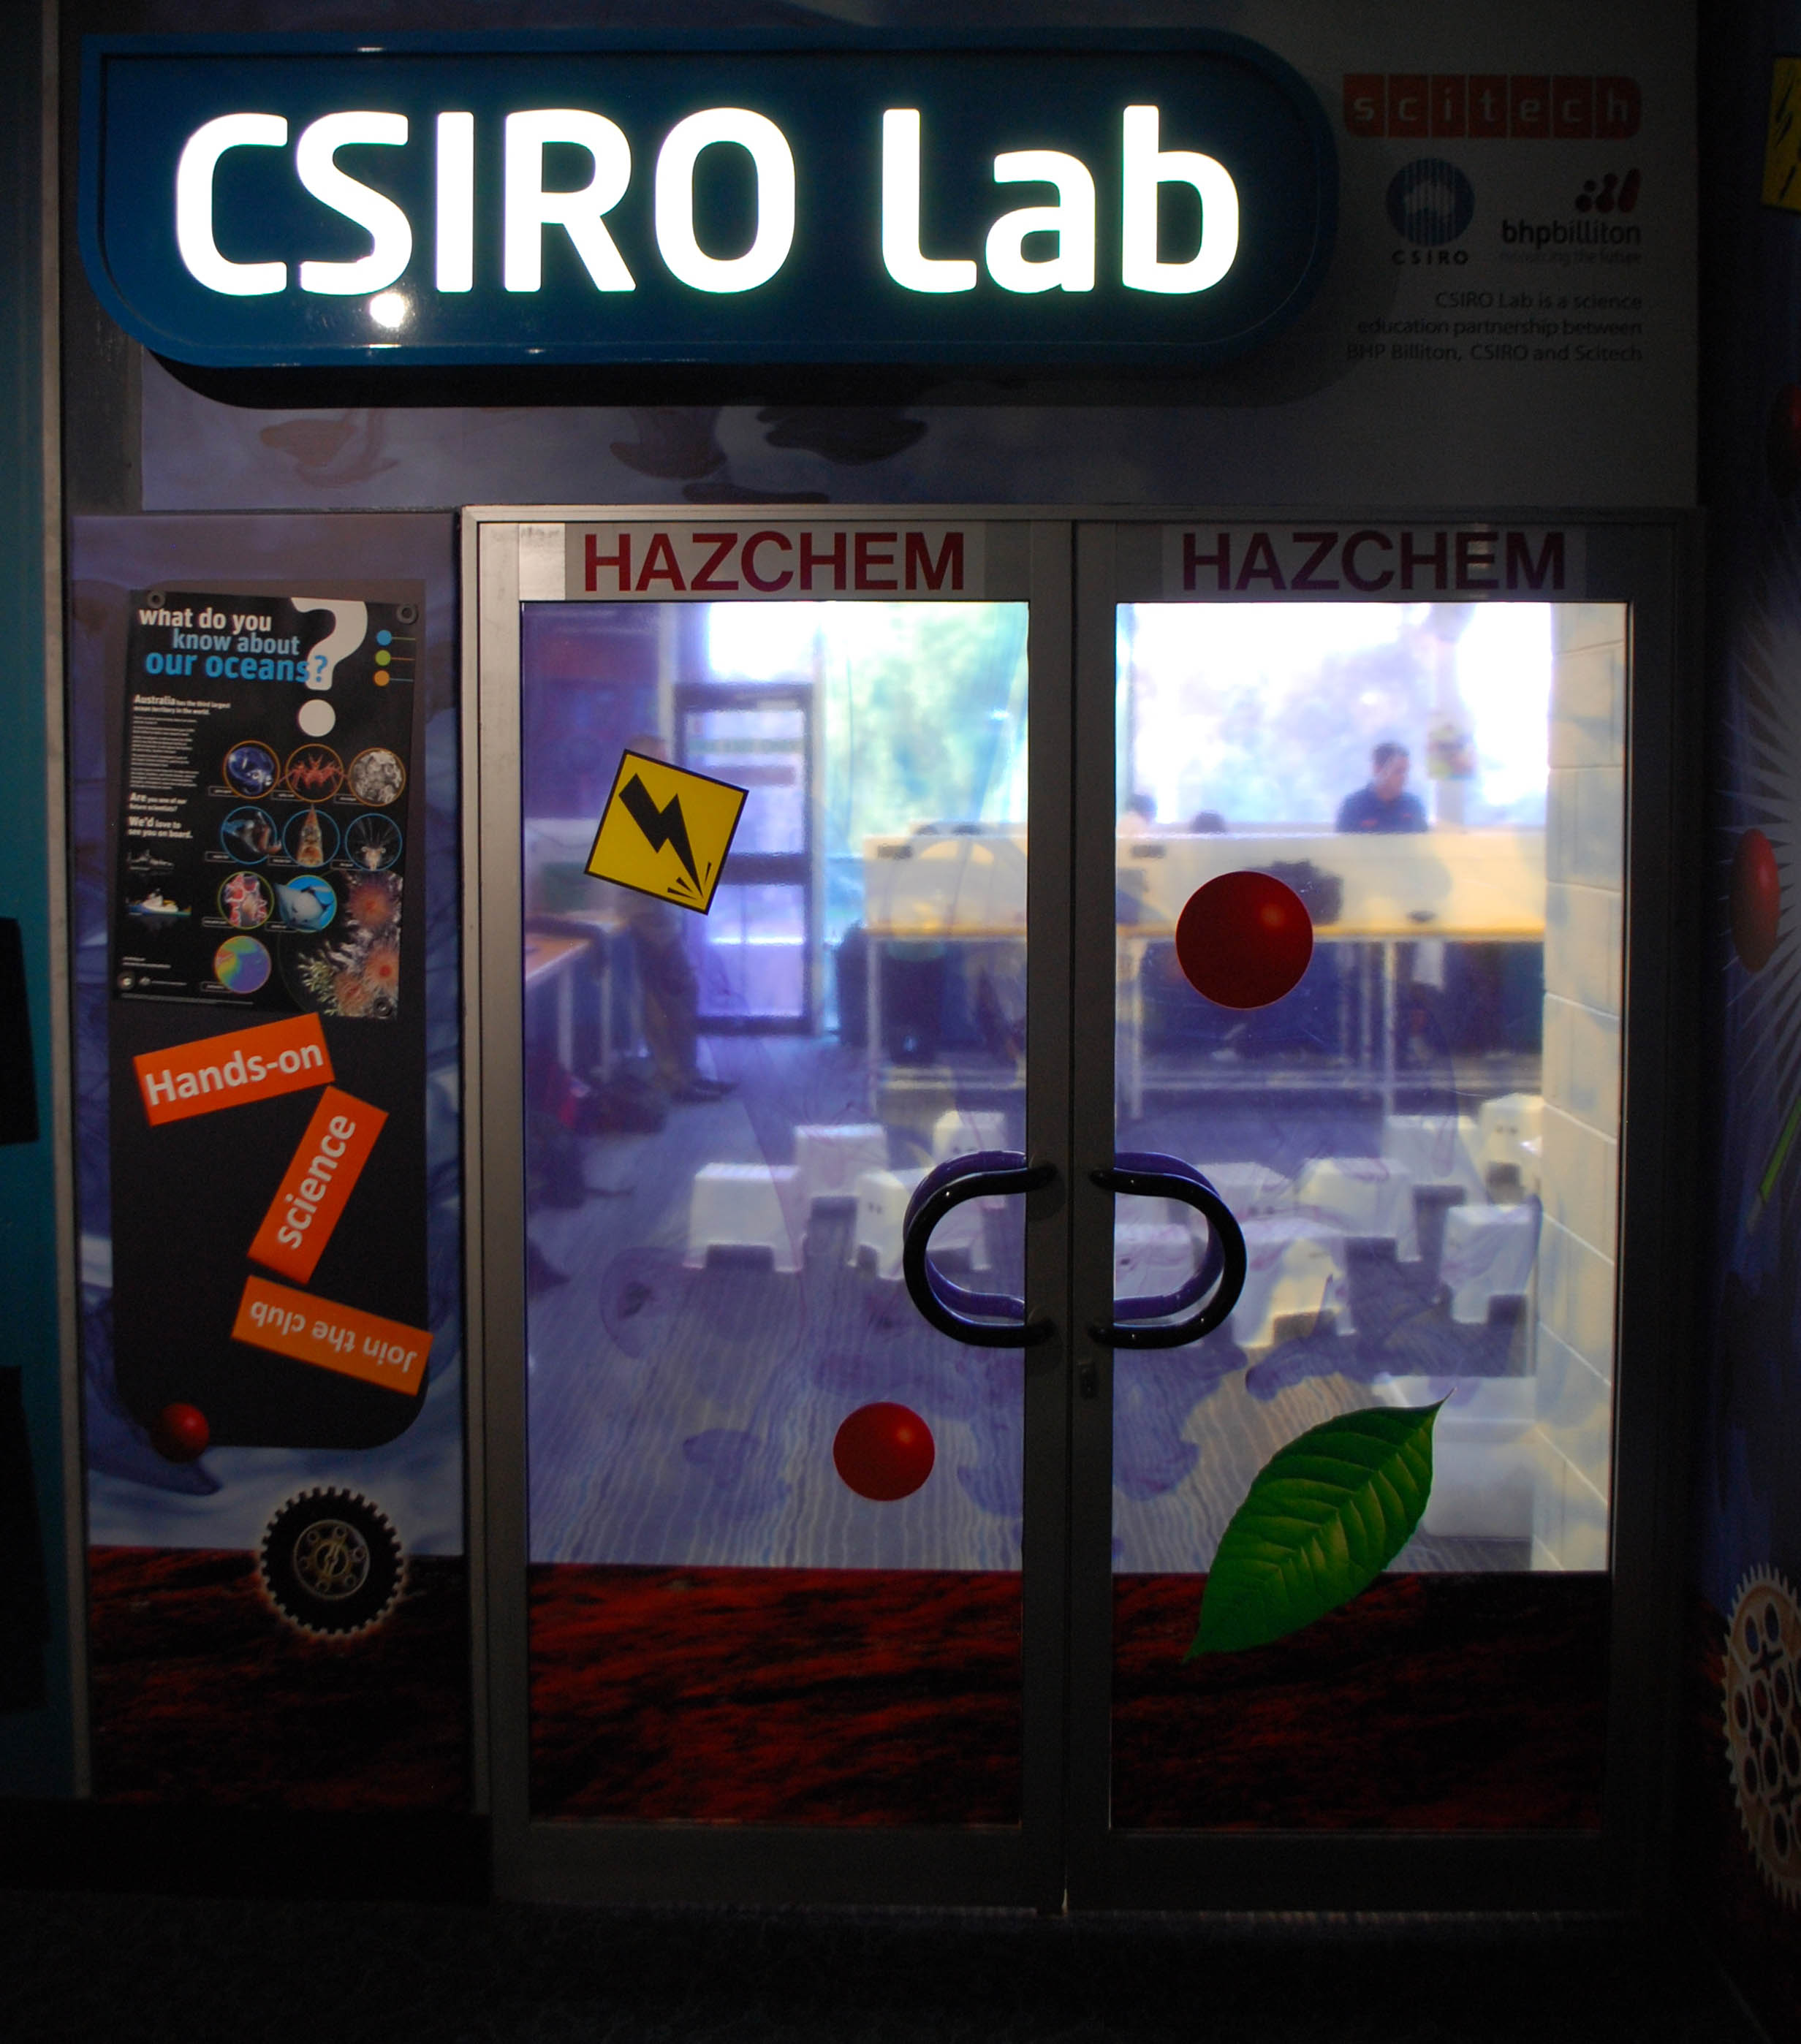 File:Scitech CSIRO Lab 2013 SMC jpg - Wikimedia Commons